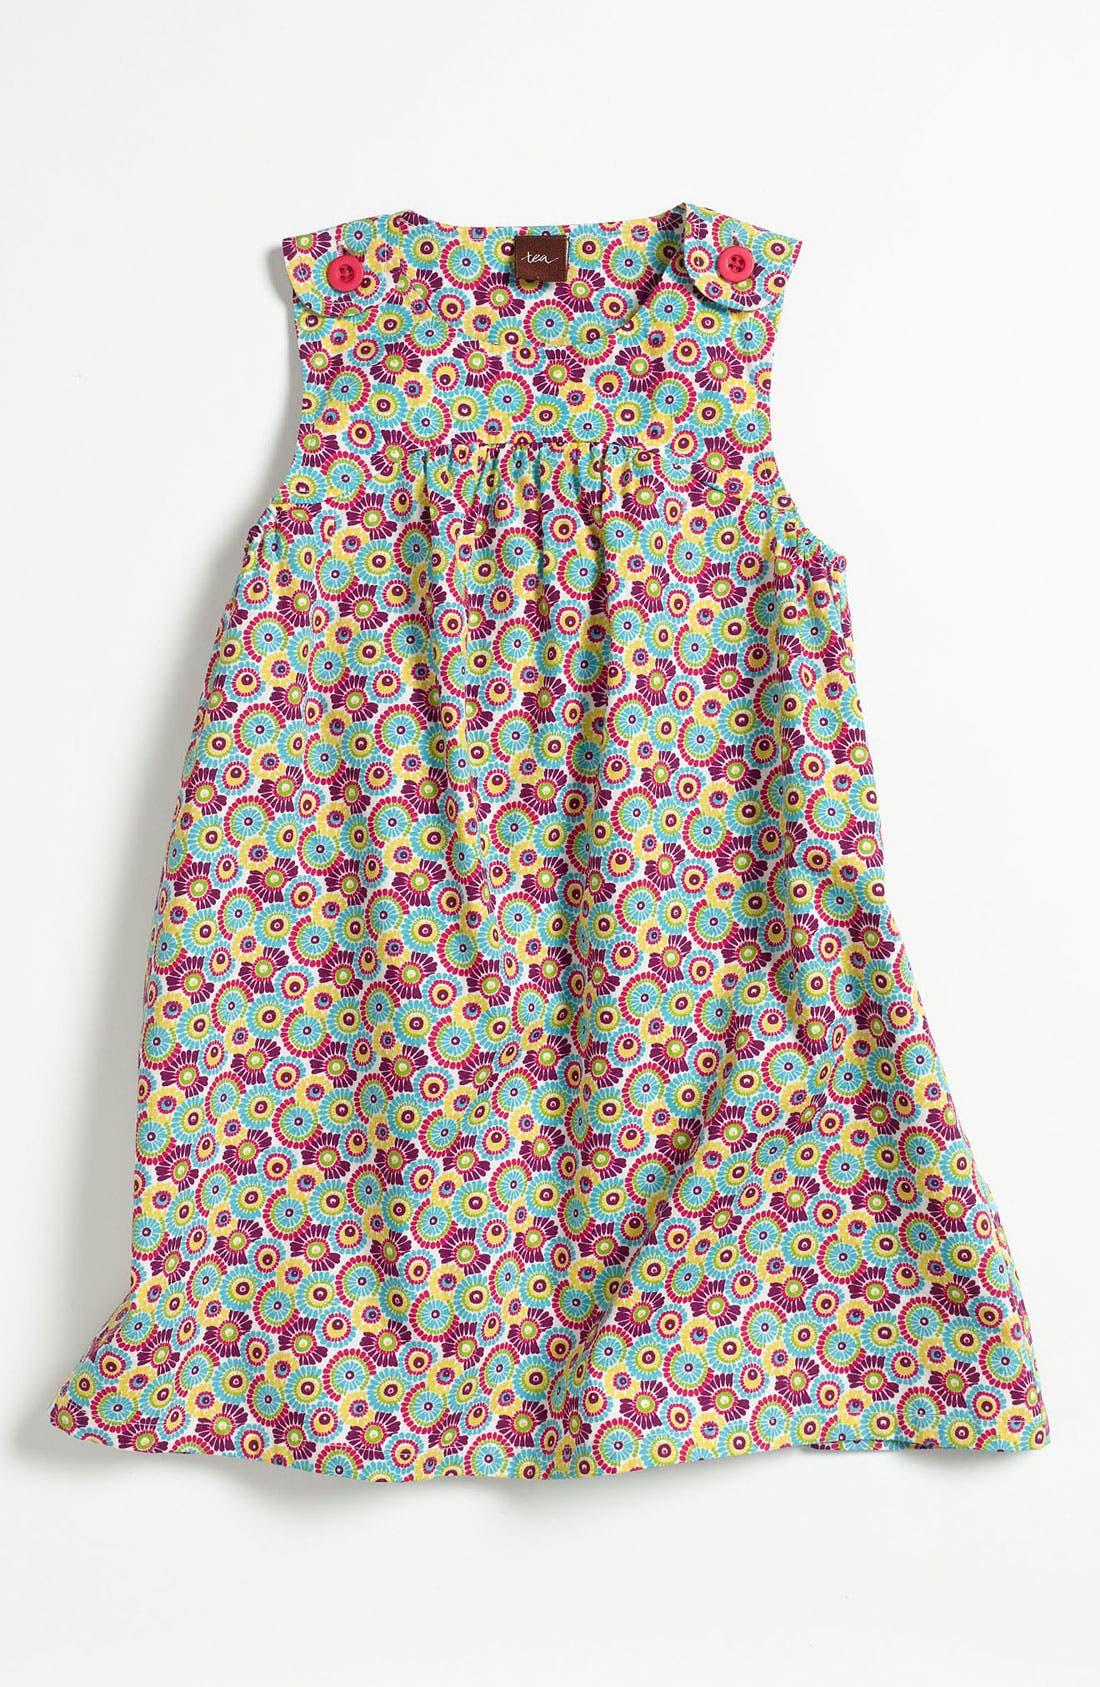 Main Image - Tea Collection 'Cactus Flower' Dress (Toddler, Little Girls & Big Girls)